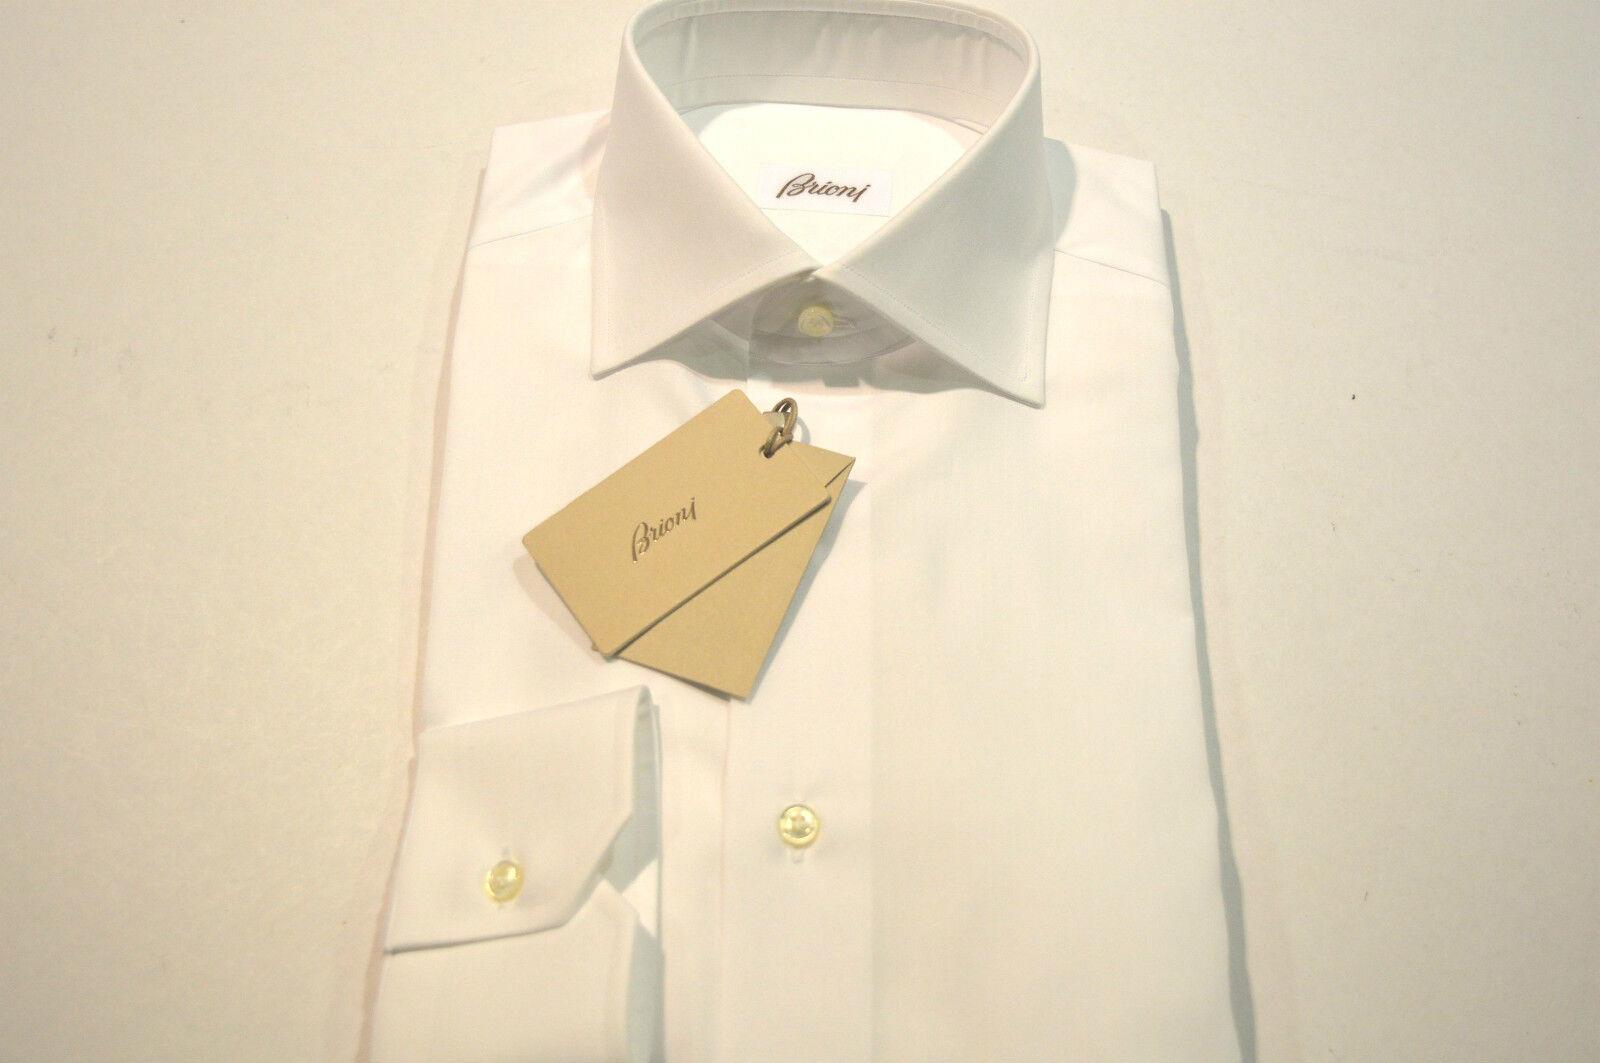 NEW  BRIONI Dress SHIRT 100% Cotton Size 17.75 Us 45 Eu  White  (Store Code AP9)